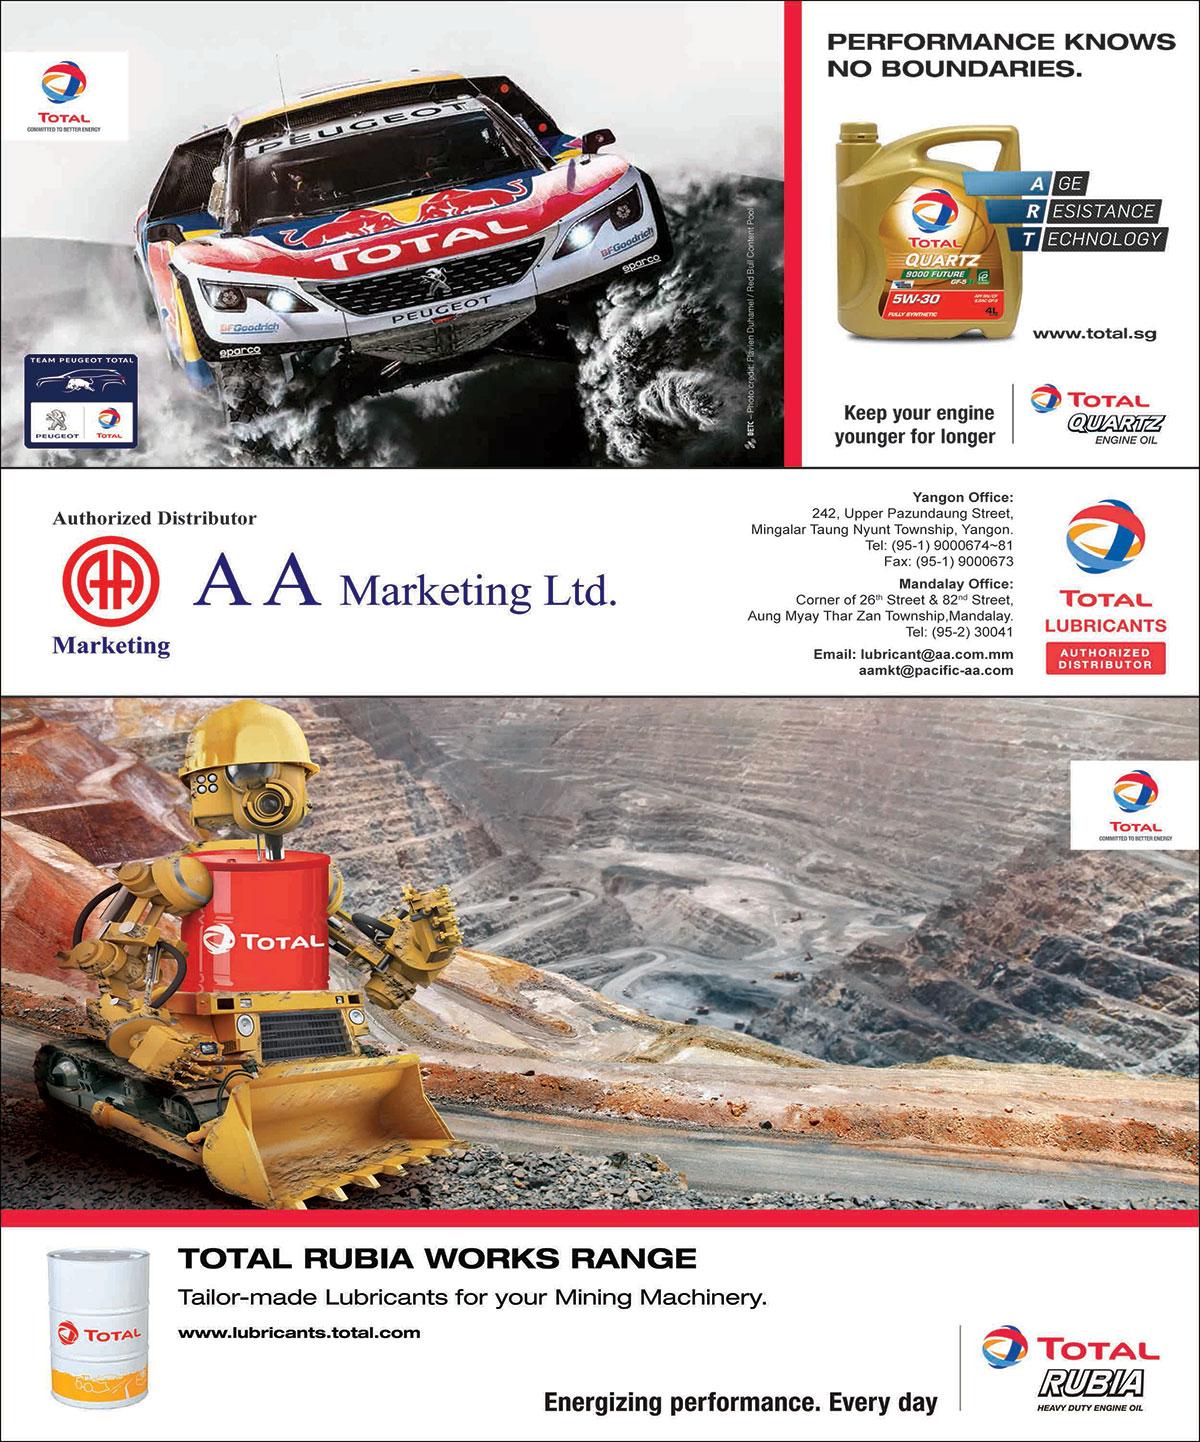 2018/Yangon/MBDL/Total-Lubricant_Car-Engine-Oil-&-Lubricants_(A)_785.jpg